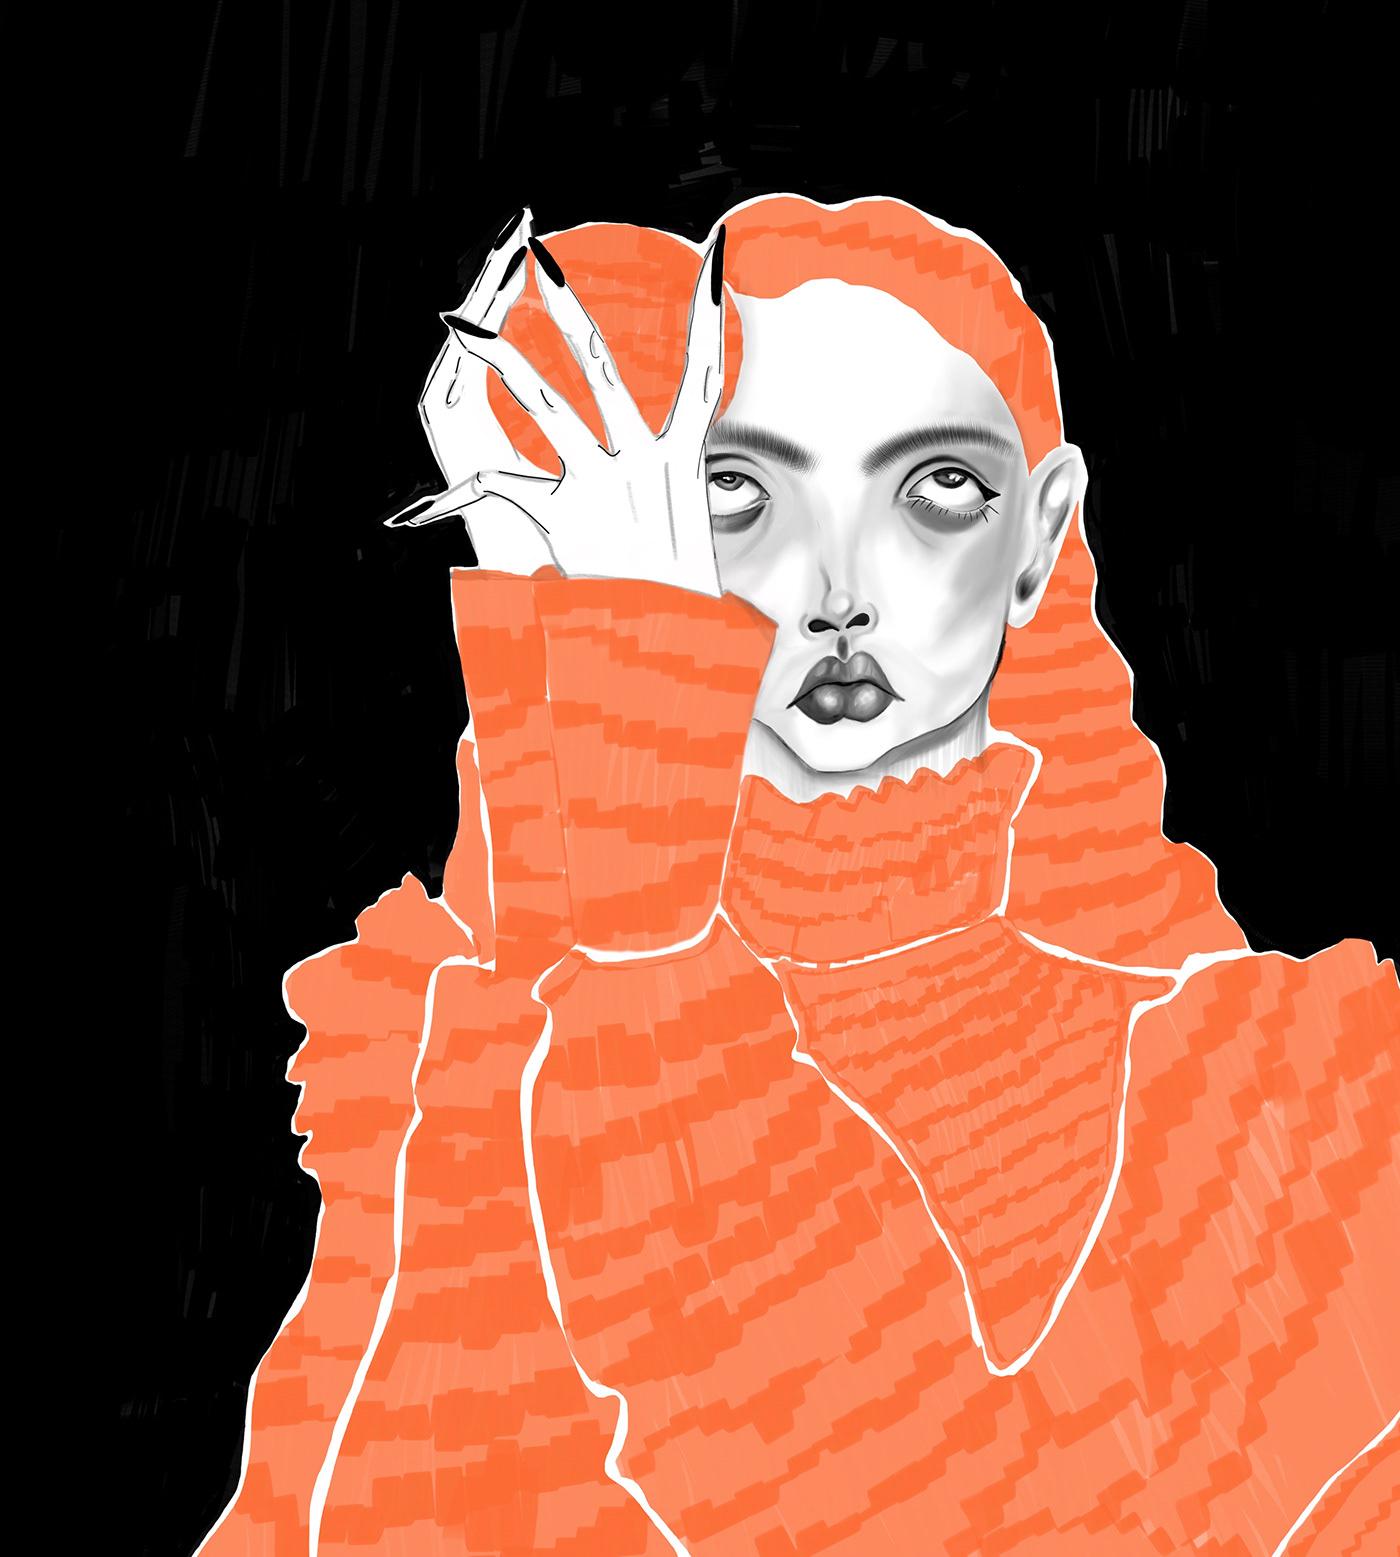 digitalart Drawing  ILLUSTRATION  adobedesign artist designer fashiondesign moodboard painting   portrait